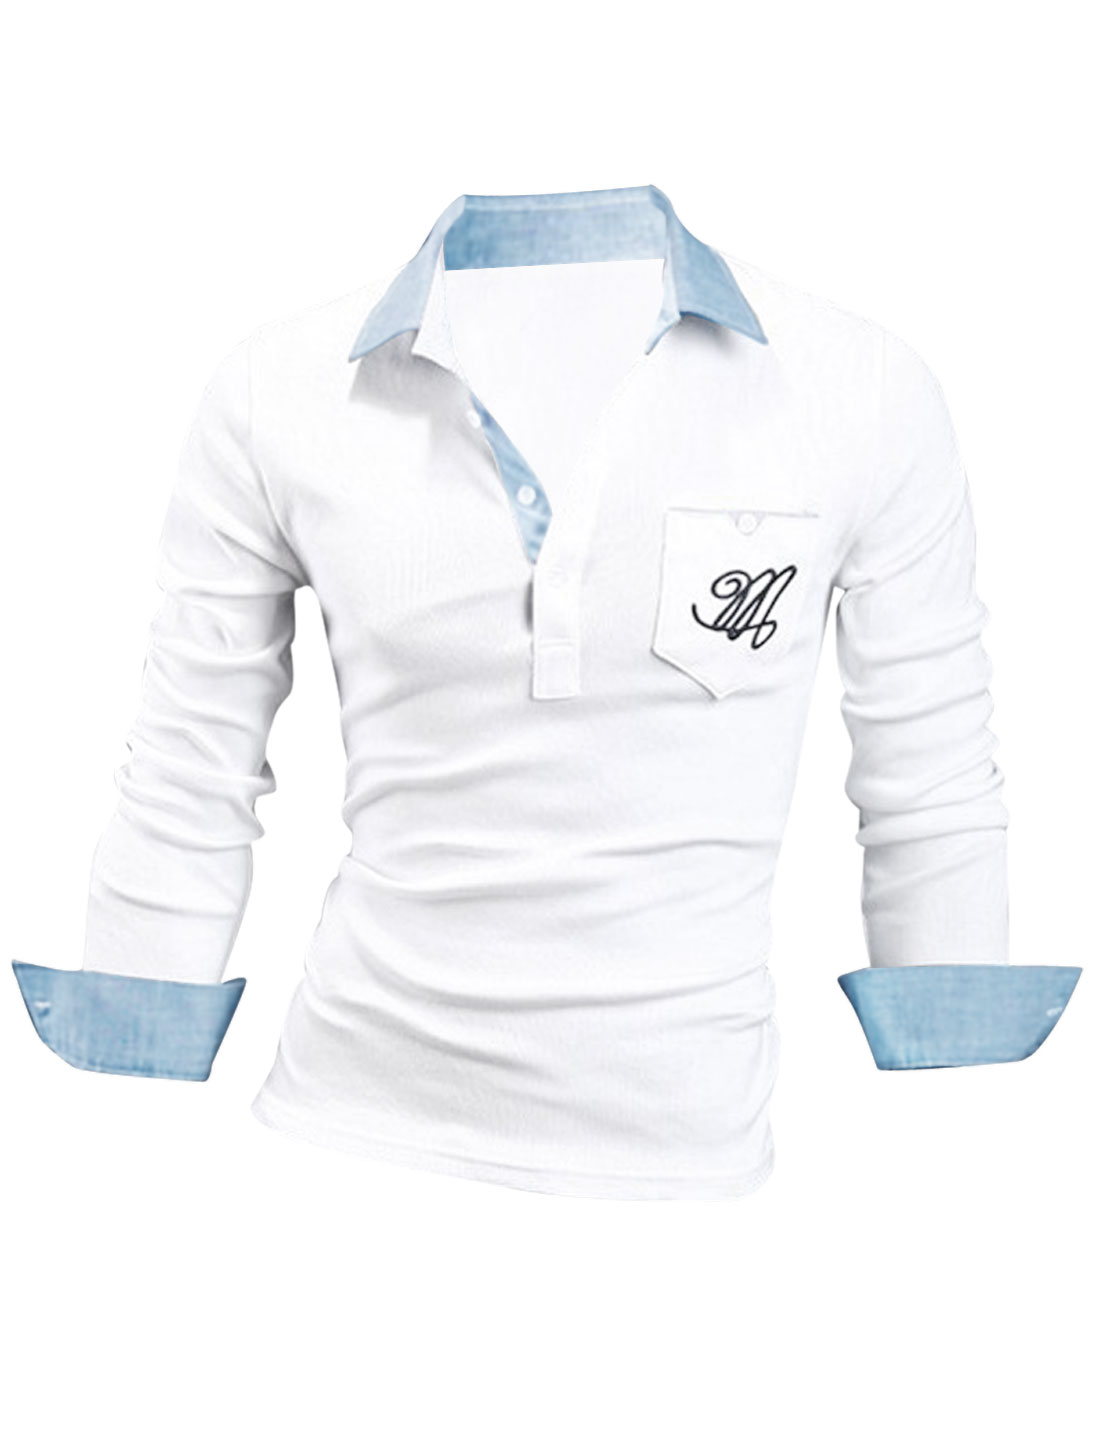 Men Long Sleeve Button Cuffs Polo Shirt White M